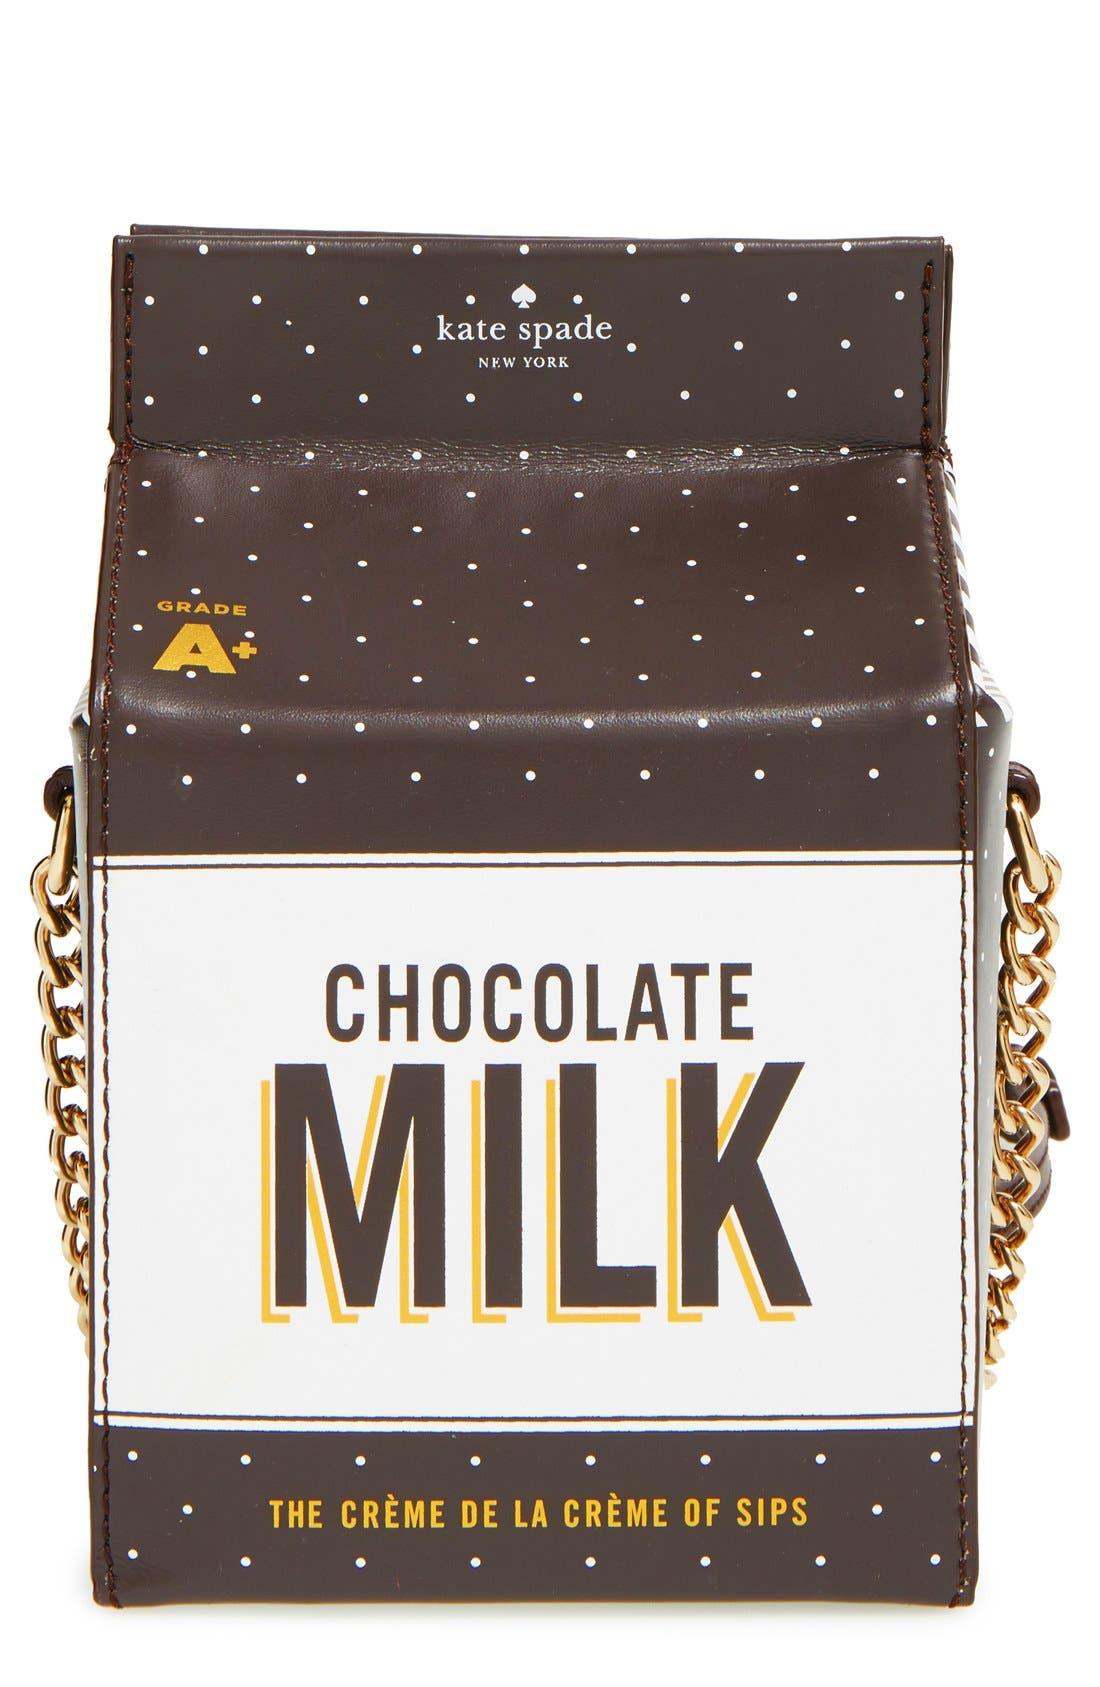 KATE SPADE NEW YORK,                             'de la crème' milk container crossbody bag,                             Main thumbnail 1, color,                             974